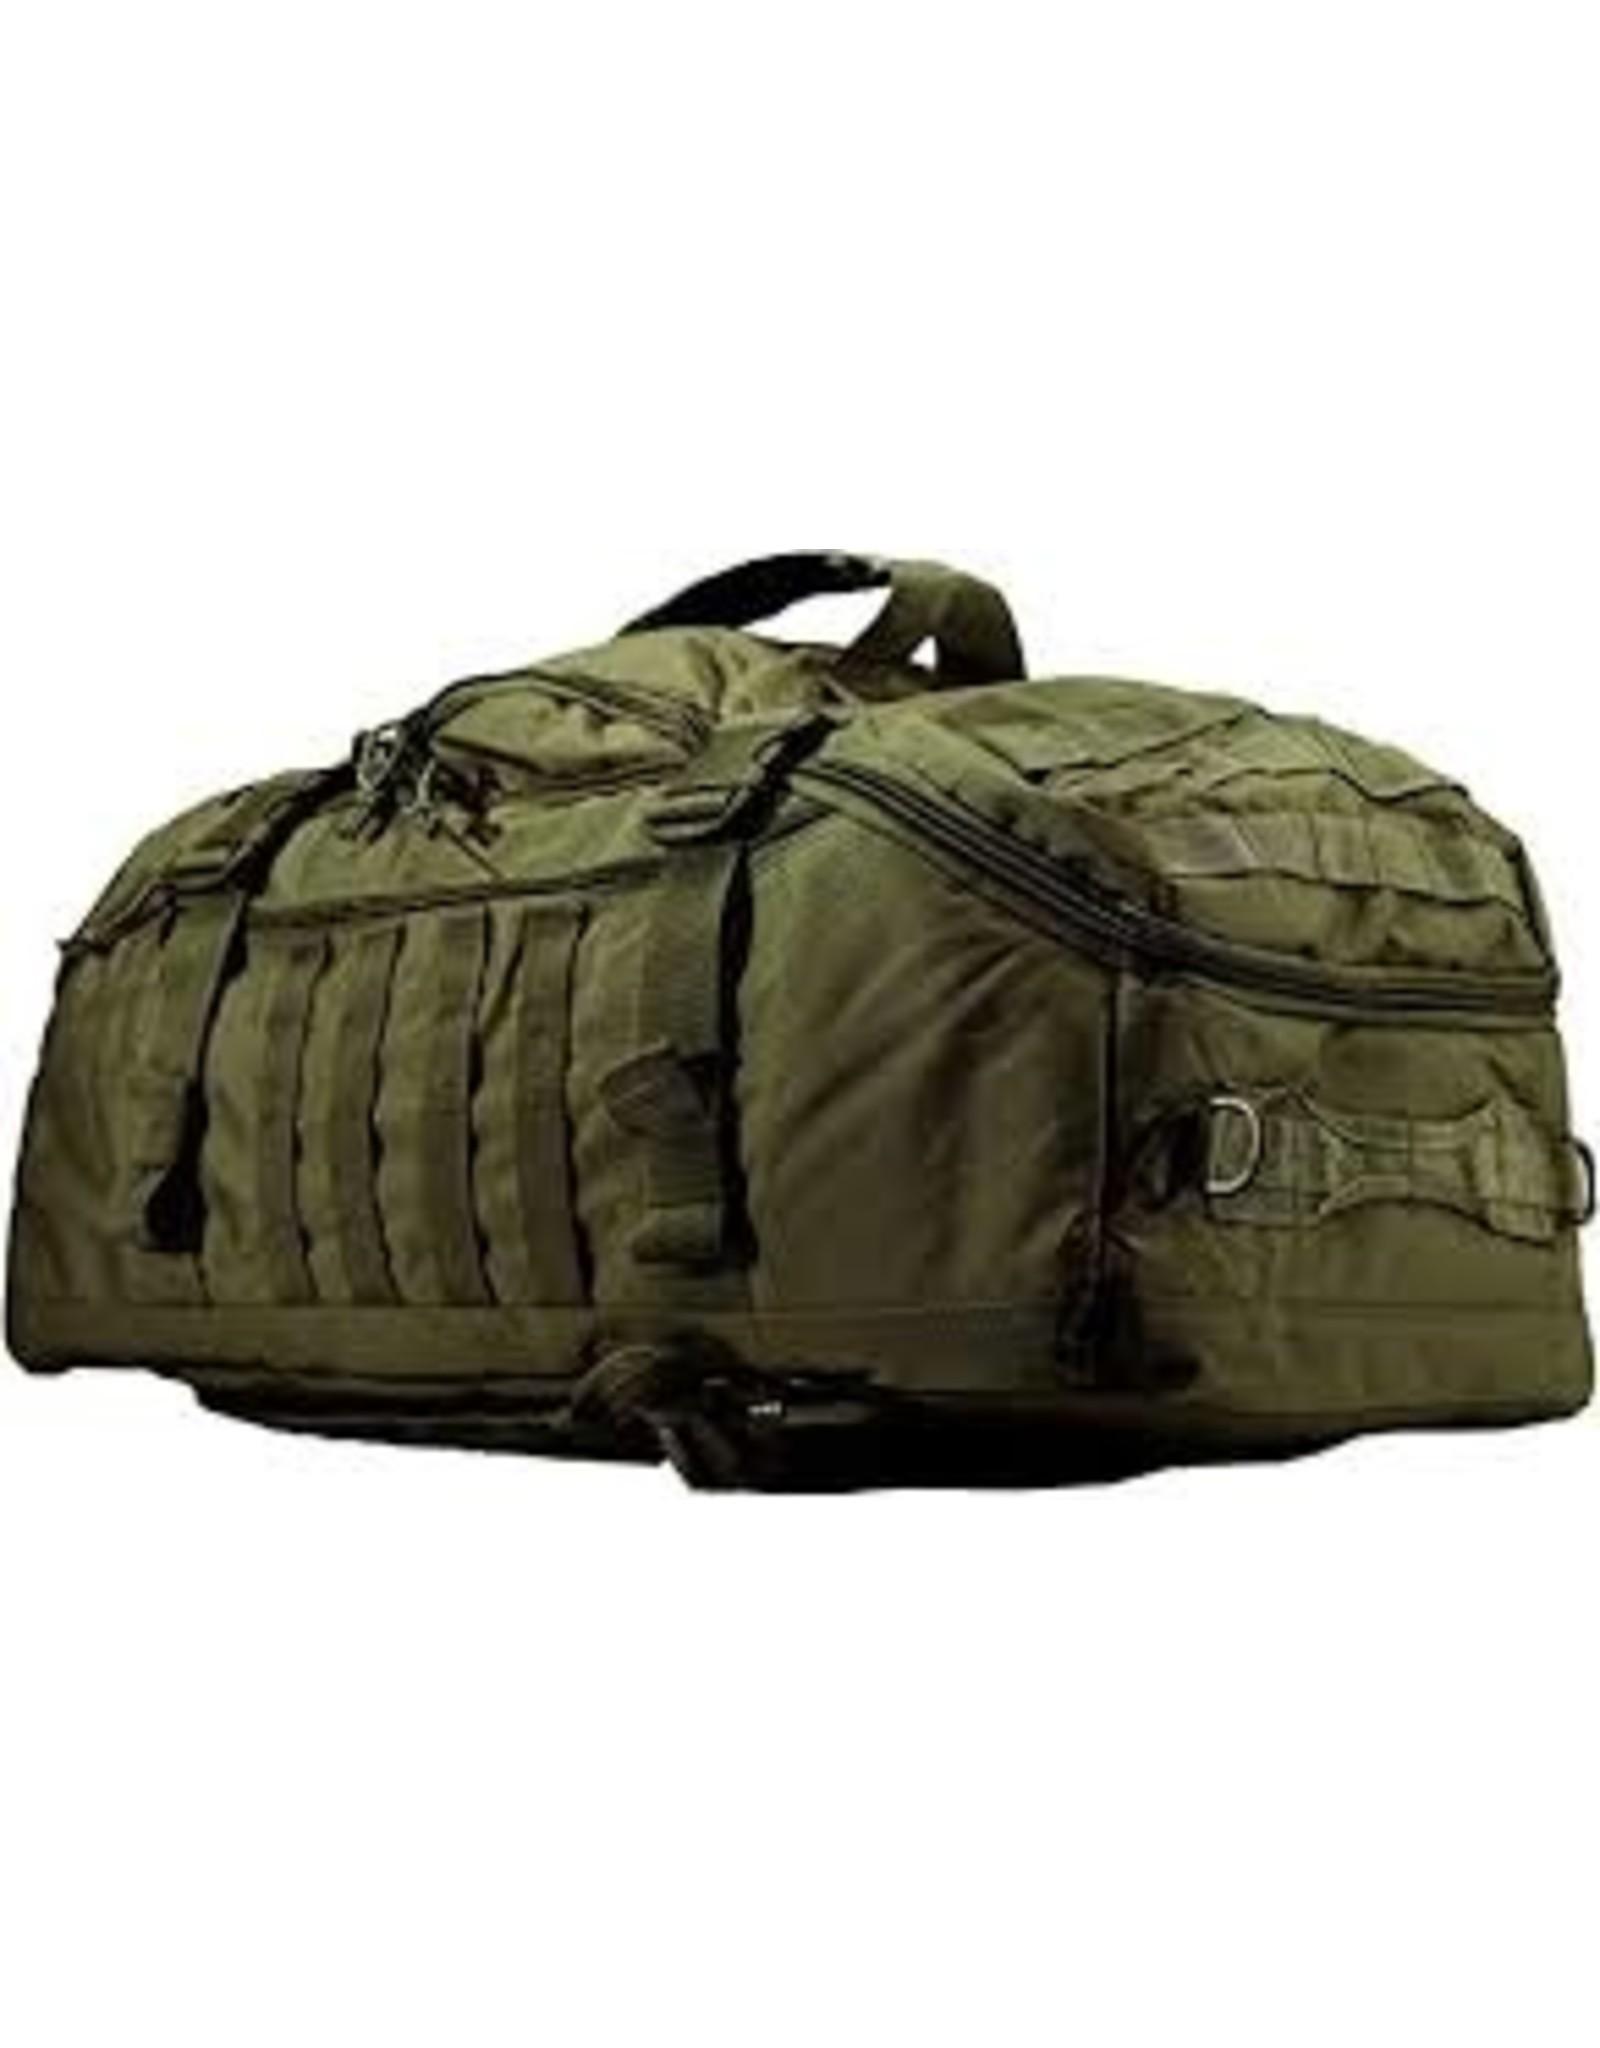 WORLD FAMOUS SPORTS 45 LITRE TACTICAL DUFFLE BAG